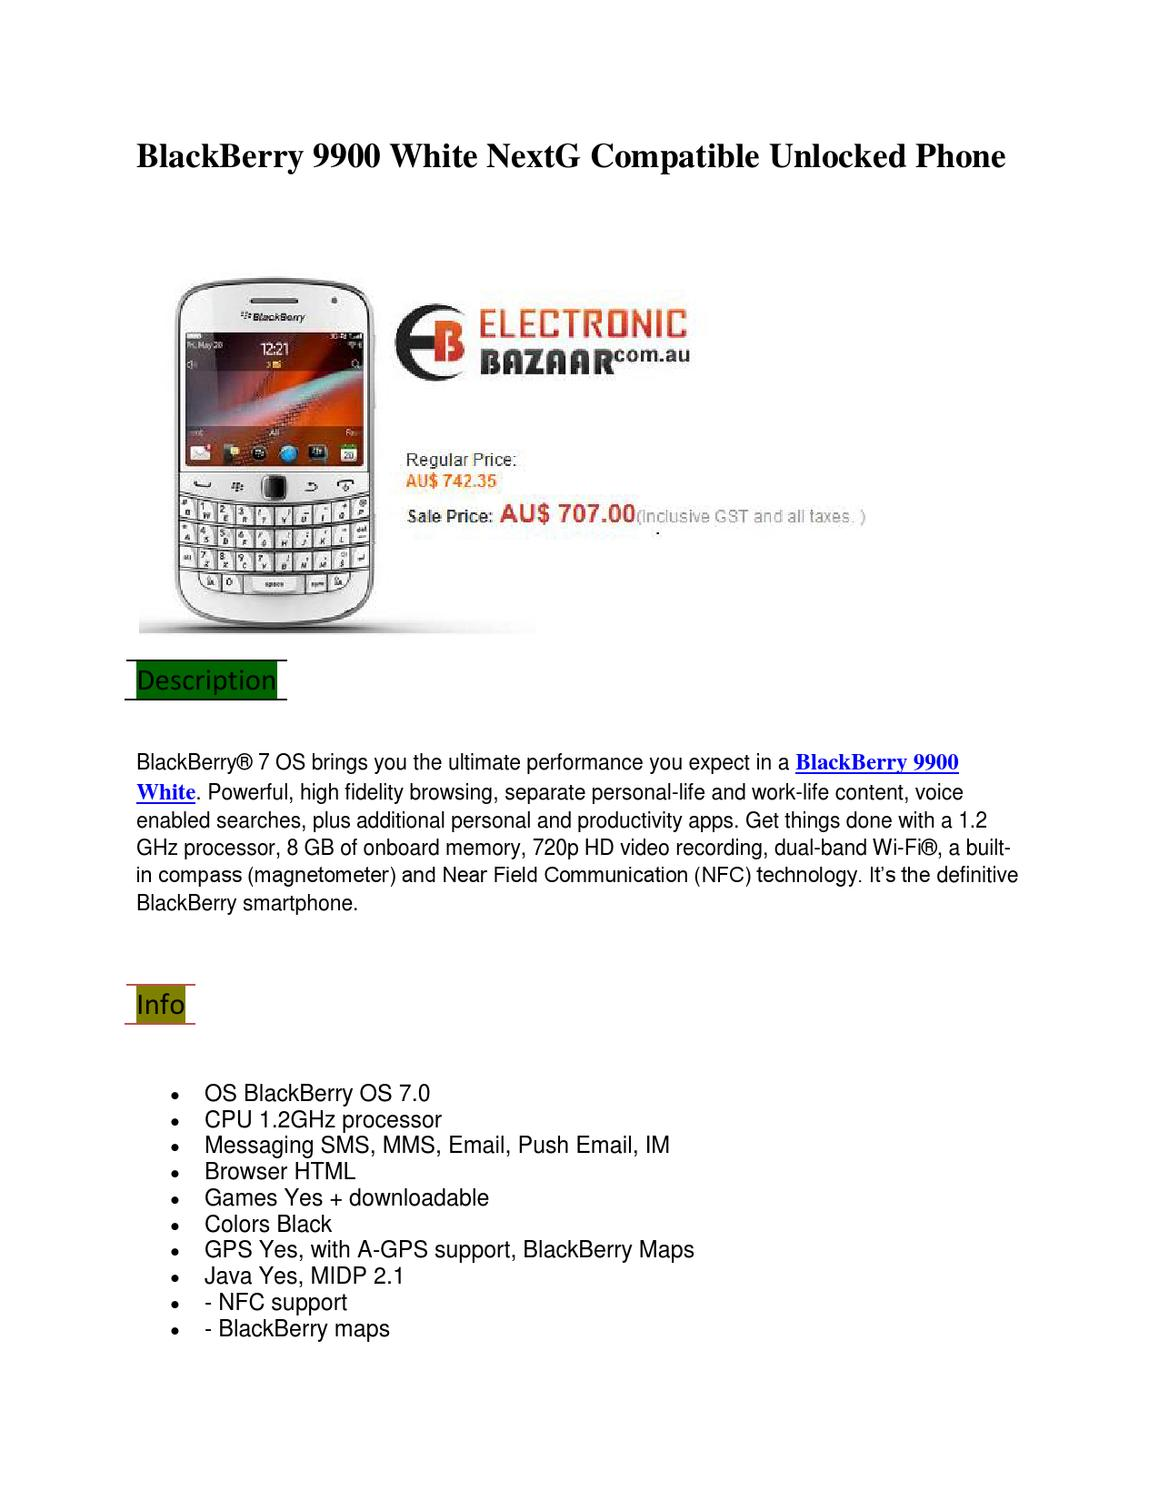 BlackBerry 9900 White by electronic bazaar - issuu